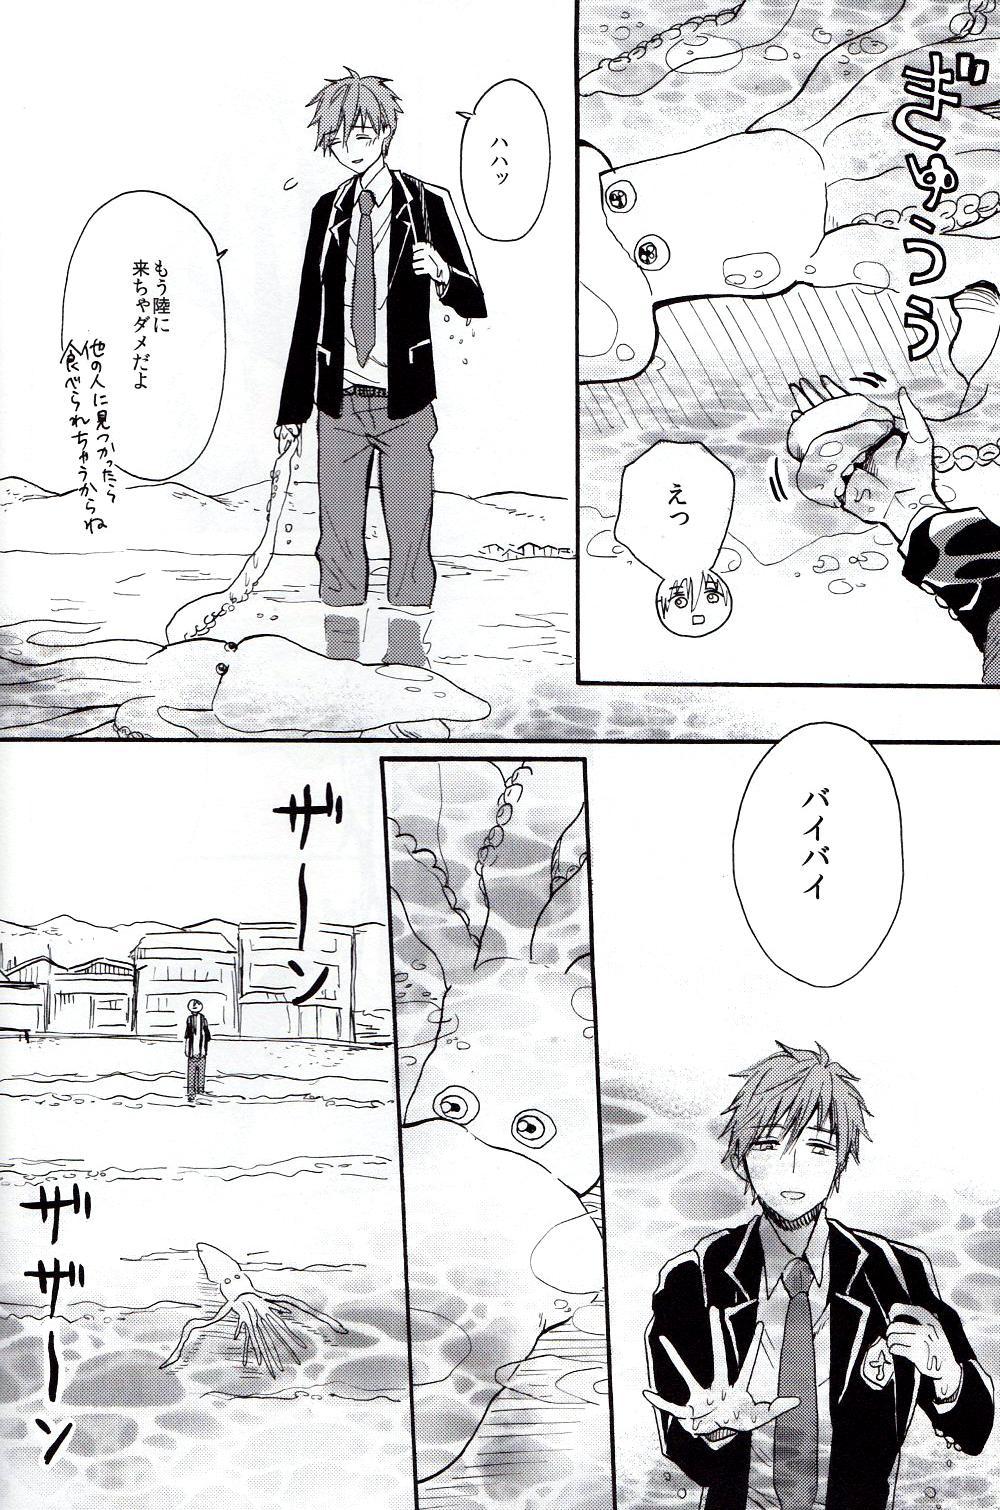 [hn (pirori)] Mako-chan jana-Ika!? (Free!) 4